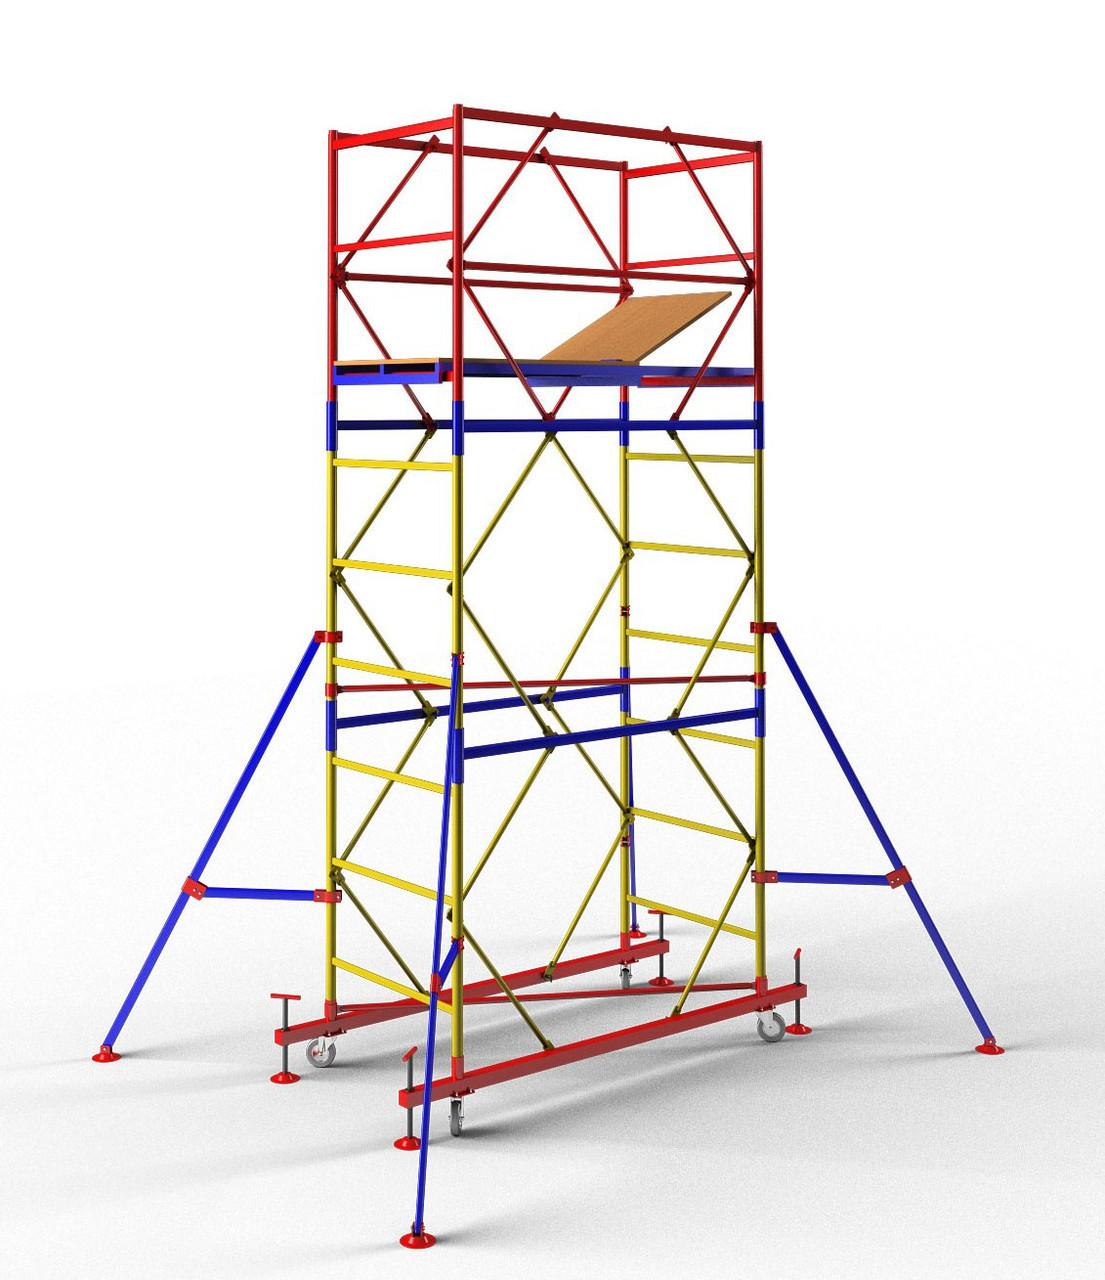 Вышка-тура мобильная облегченная 2,0 х 2,0 м (6+1) Раб.высота 9,8 м